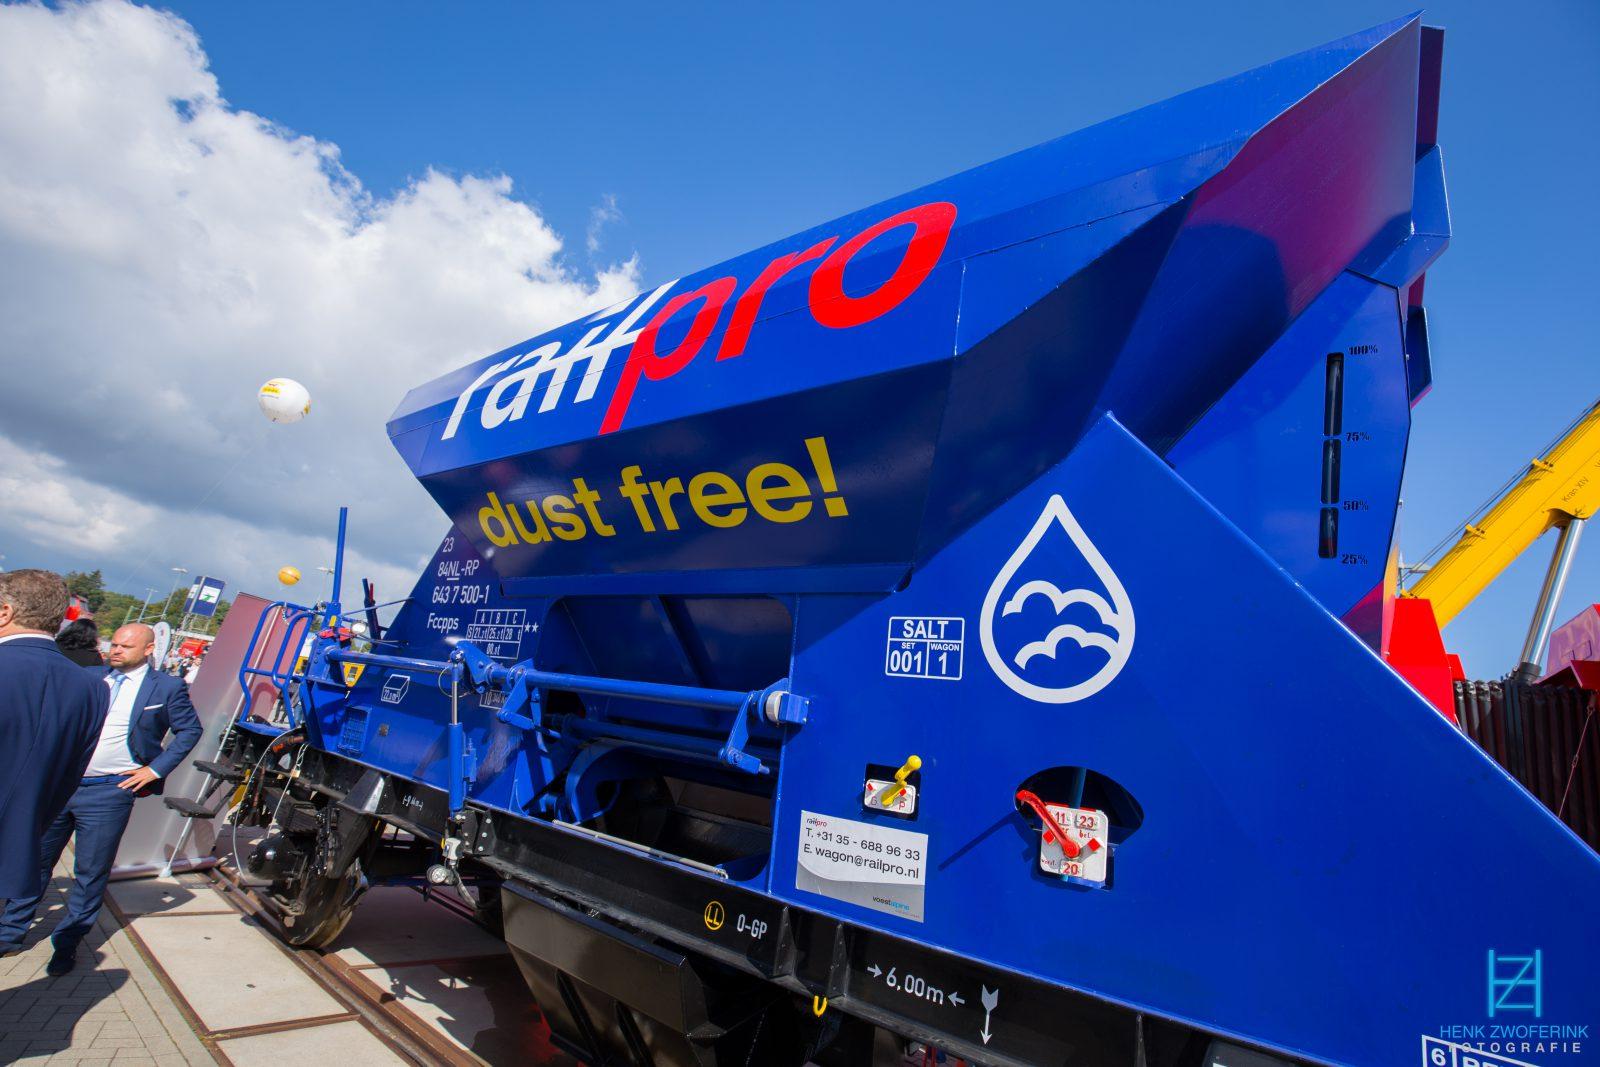 Railpro dust free - Henk Zwoferink